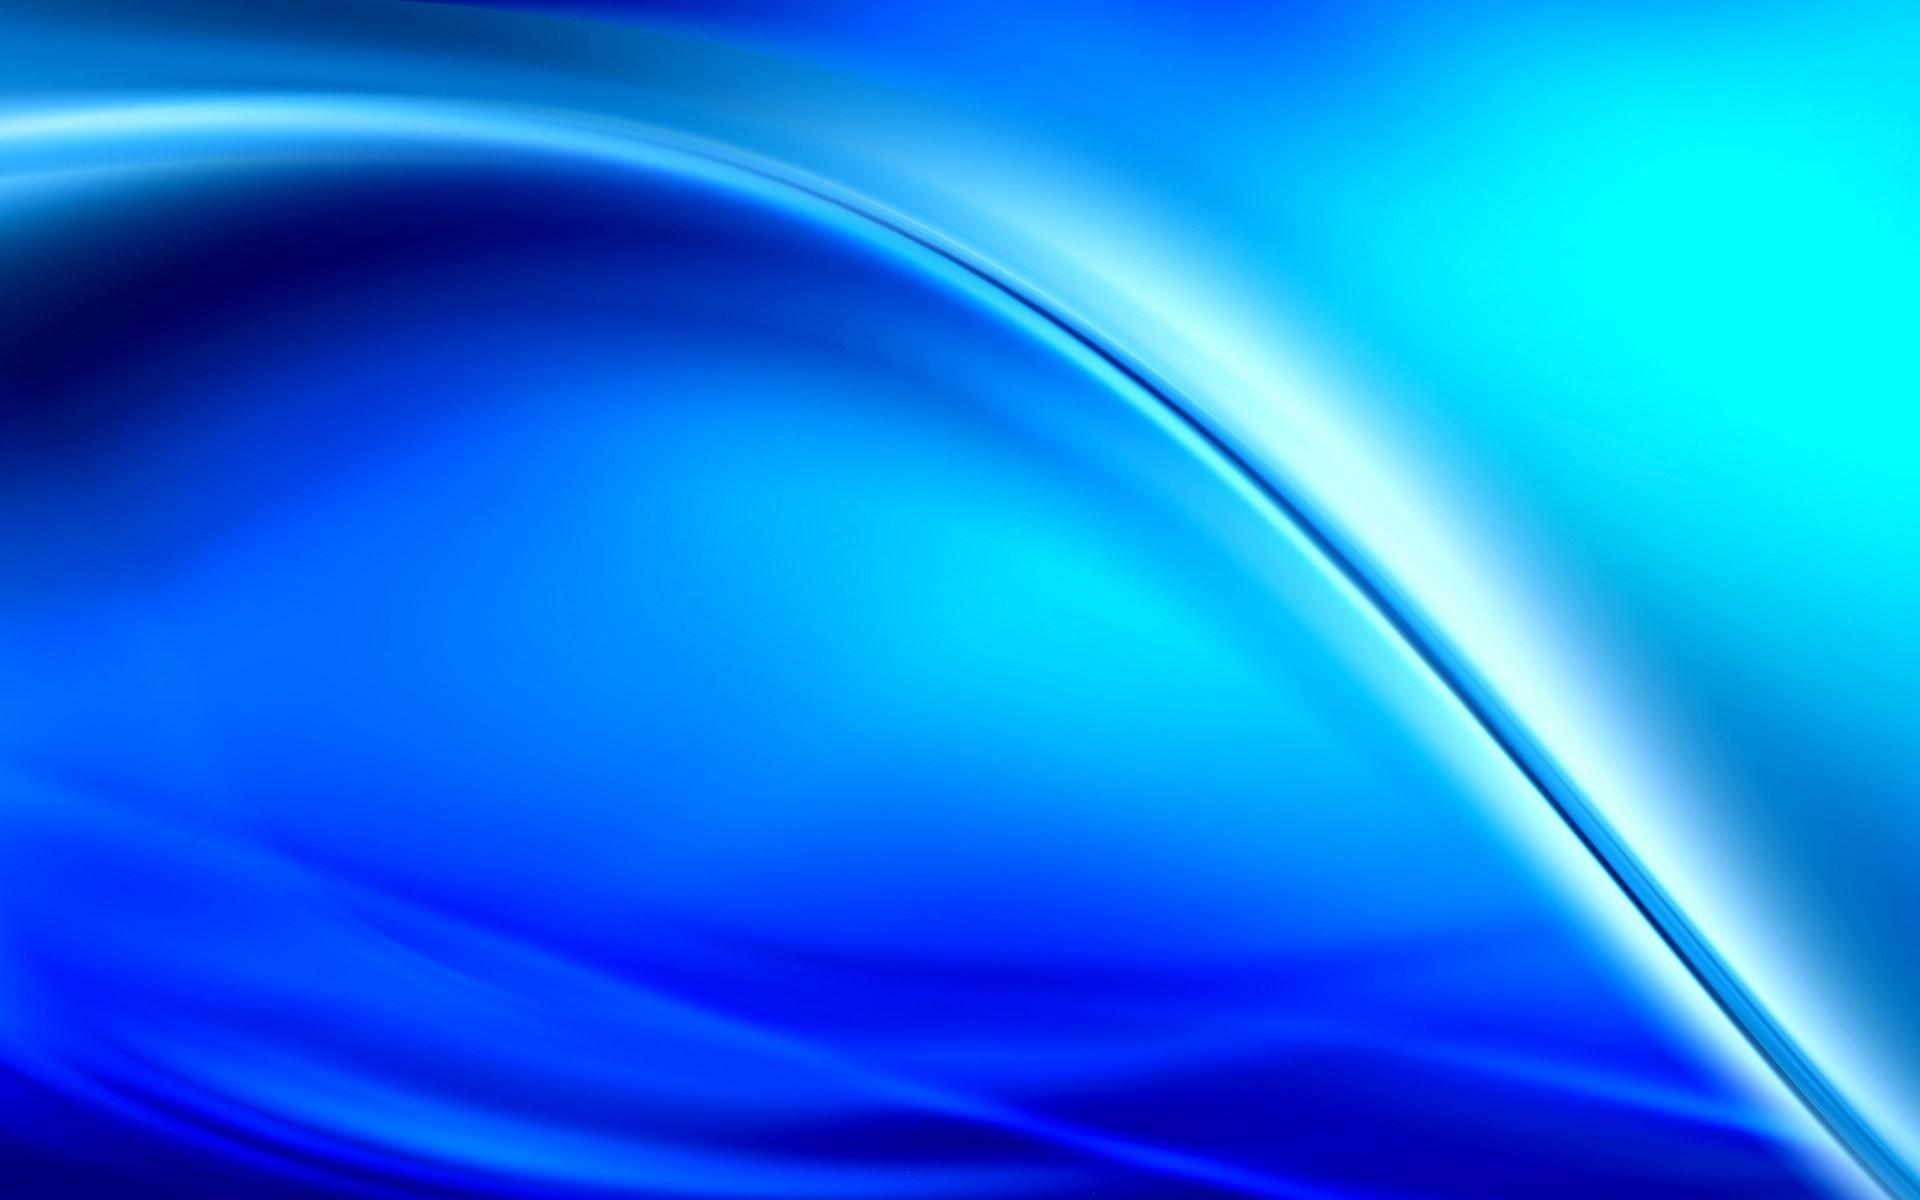 Bright Blue 3D Abstract Wallpaper HD Wallpaper 1920x1200